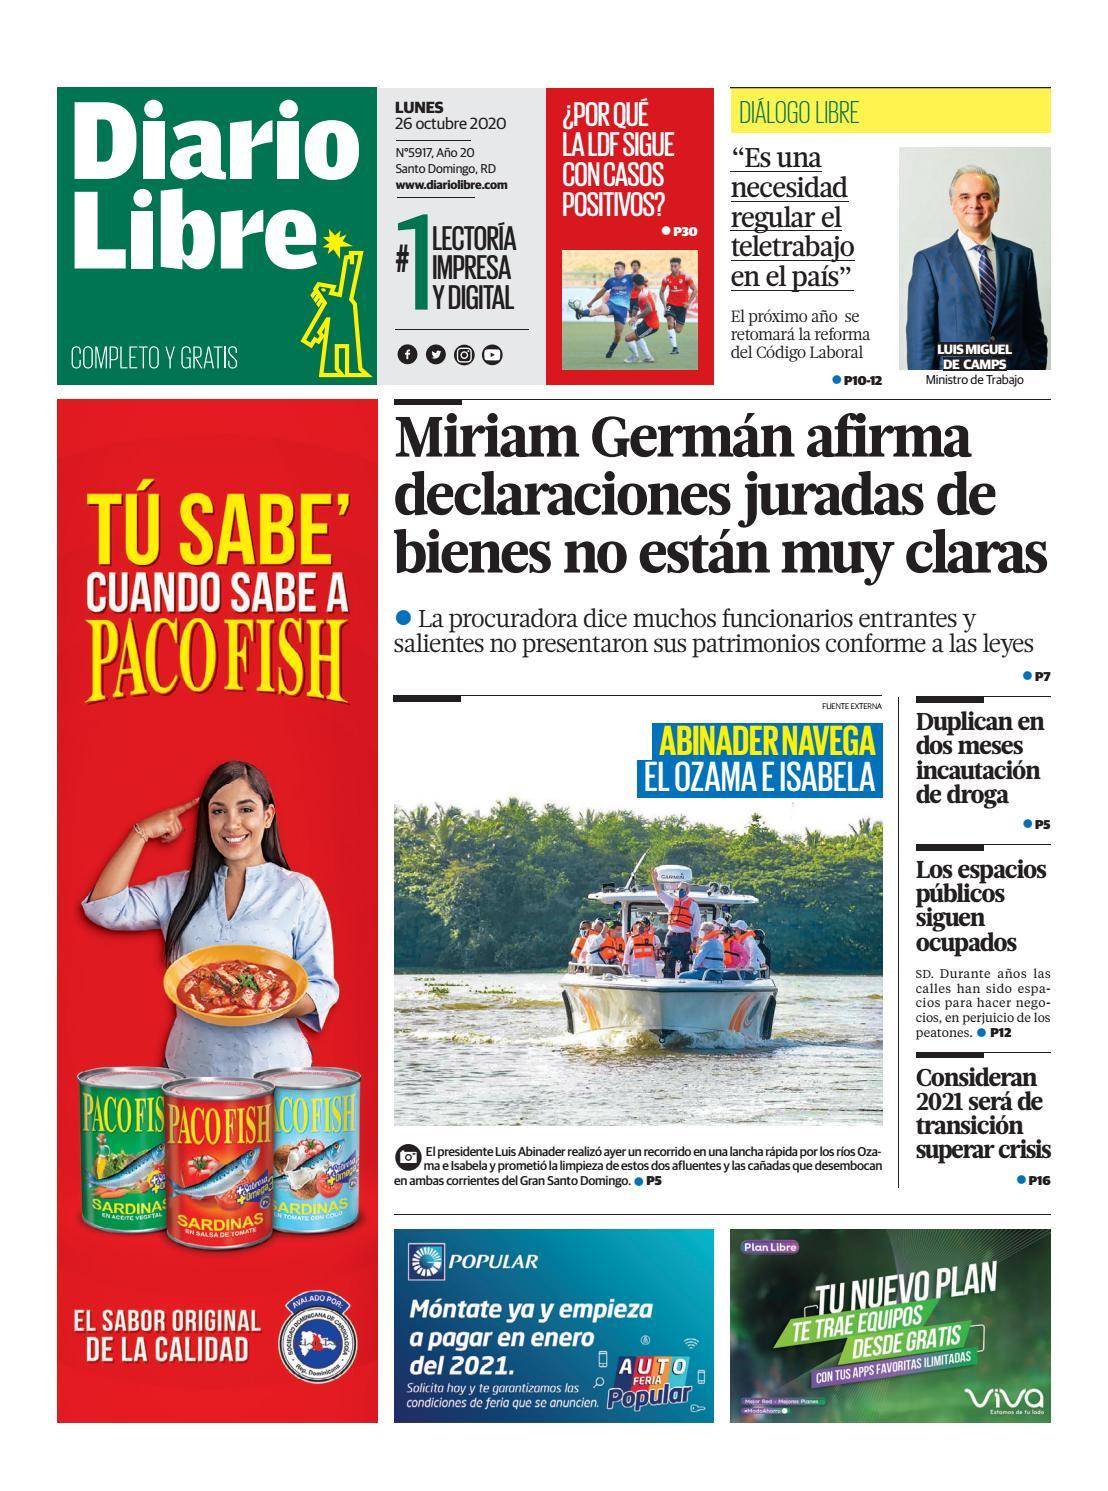 Portada Periódico Diario Libre, Lunes 26 de Octubre, 2020